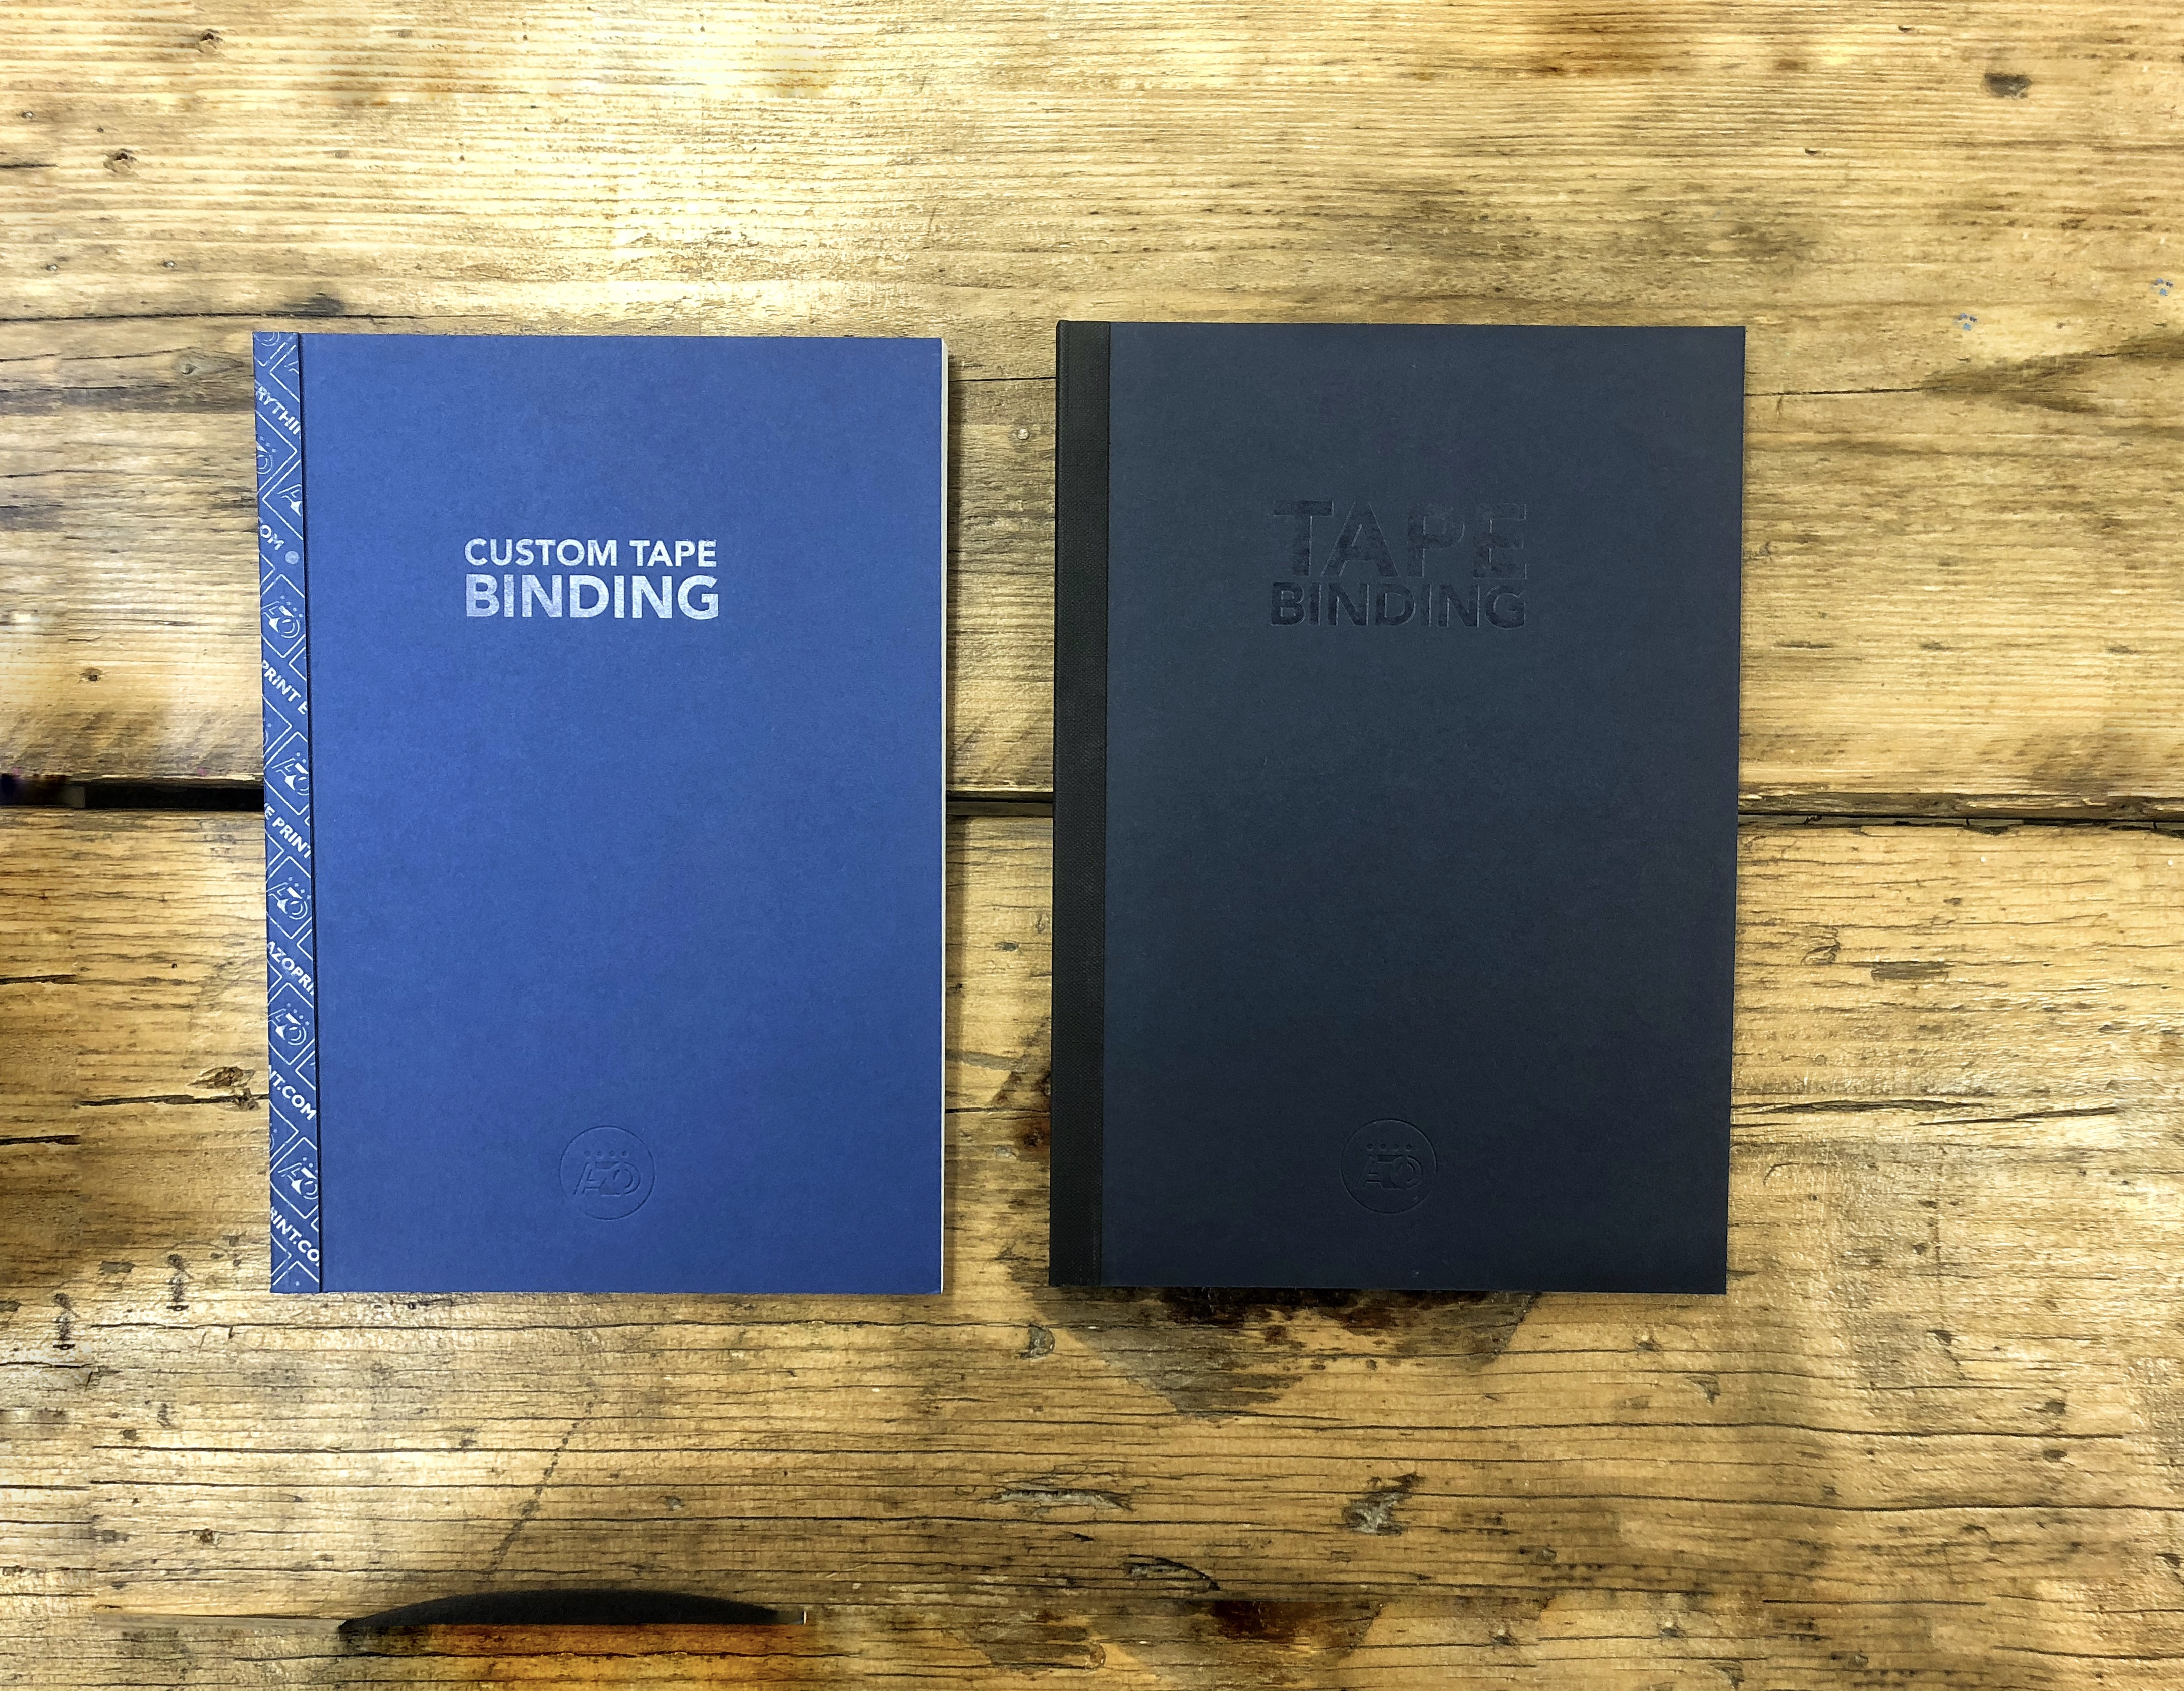 Custom tape and tape binding